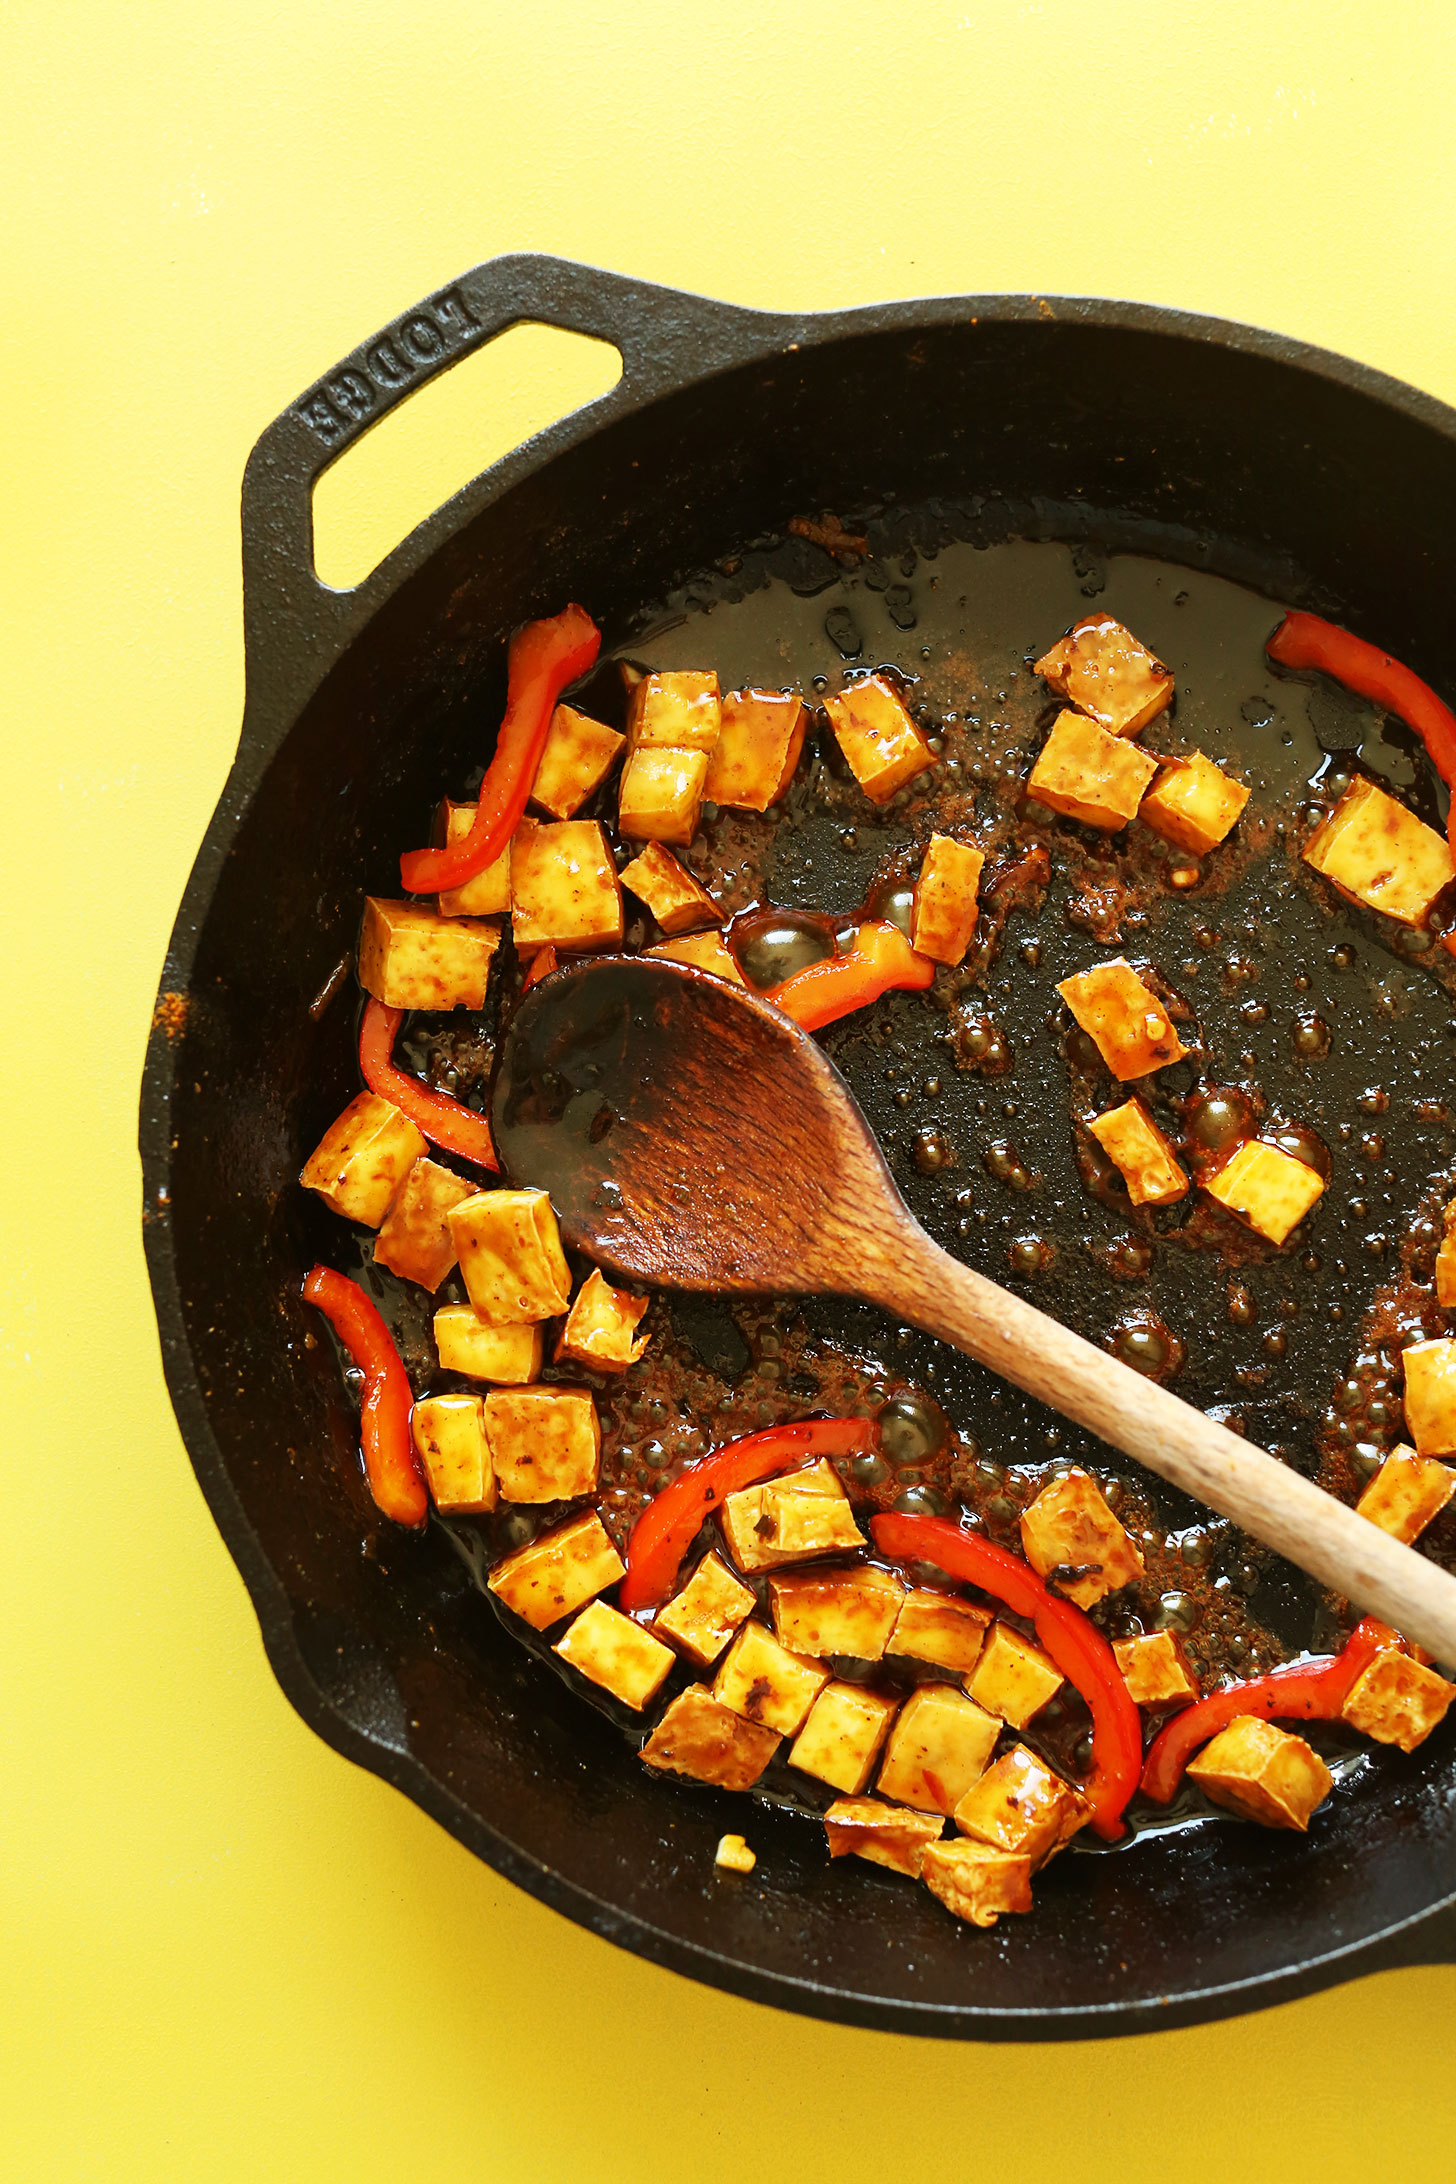 EASY Crispy Tofu, Baked not Fried! #vegan #tofu #glutenfree #healthy #recipe #minimalistbaker